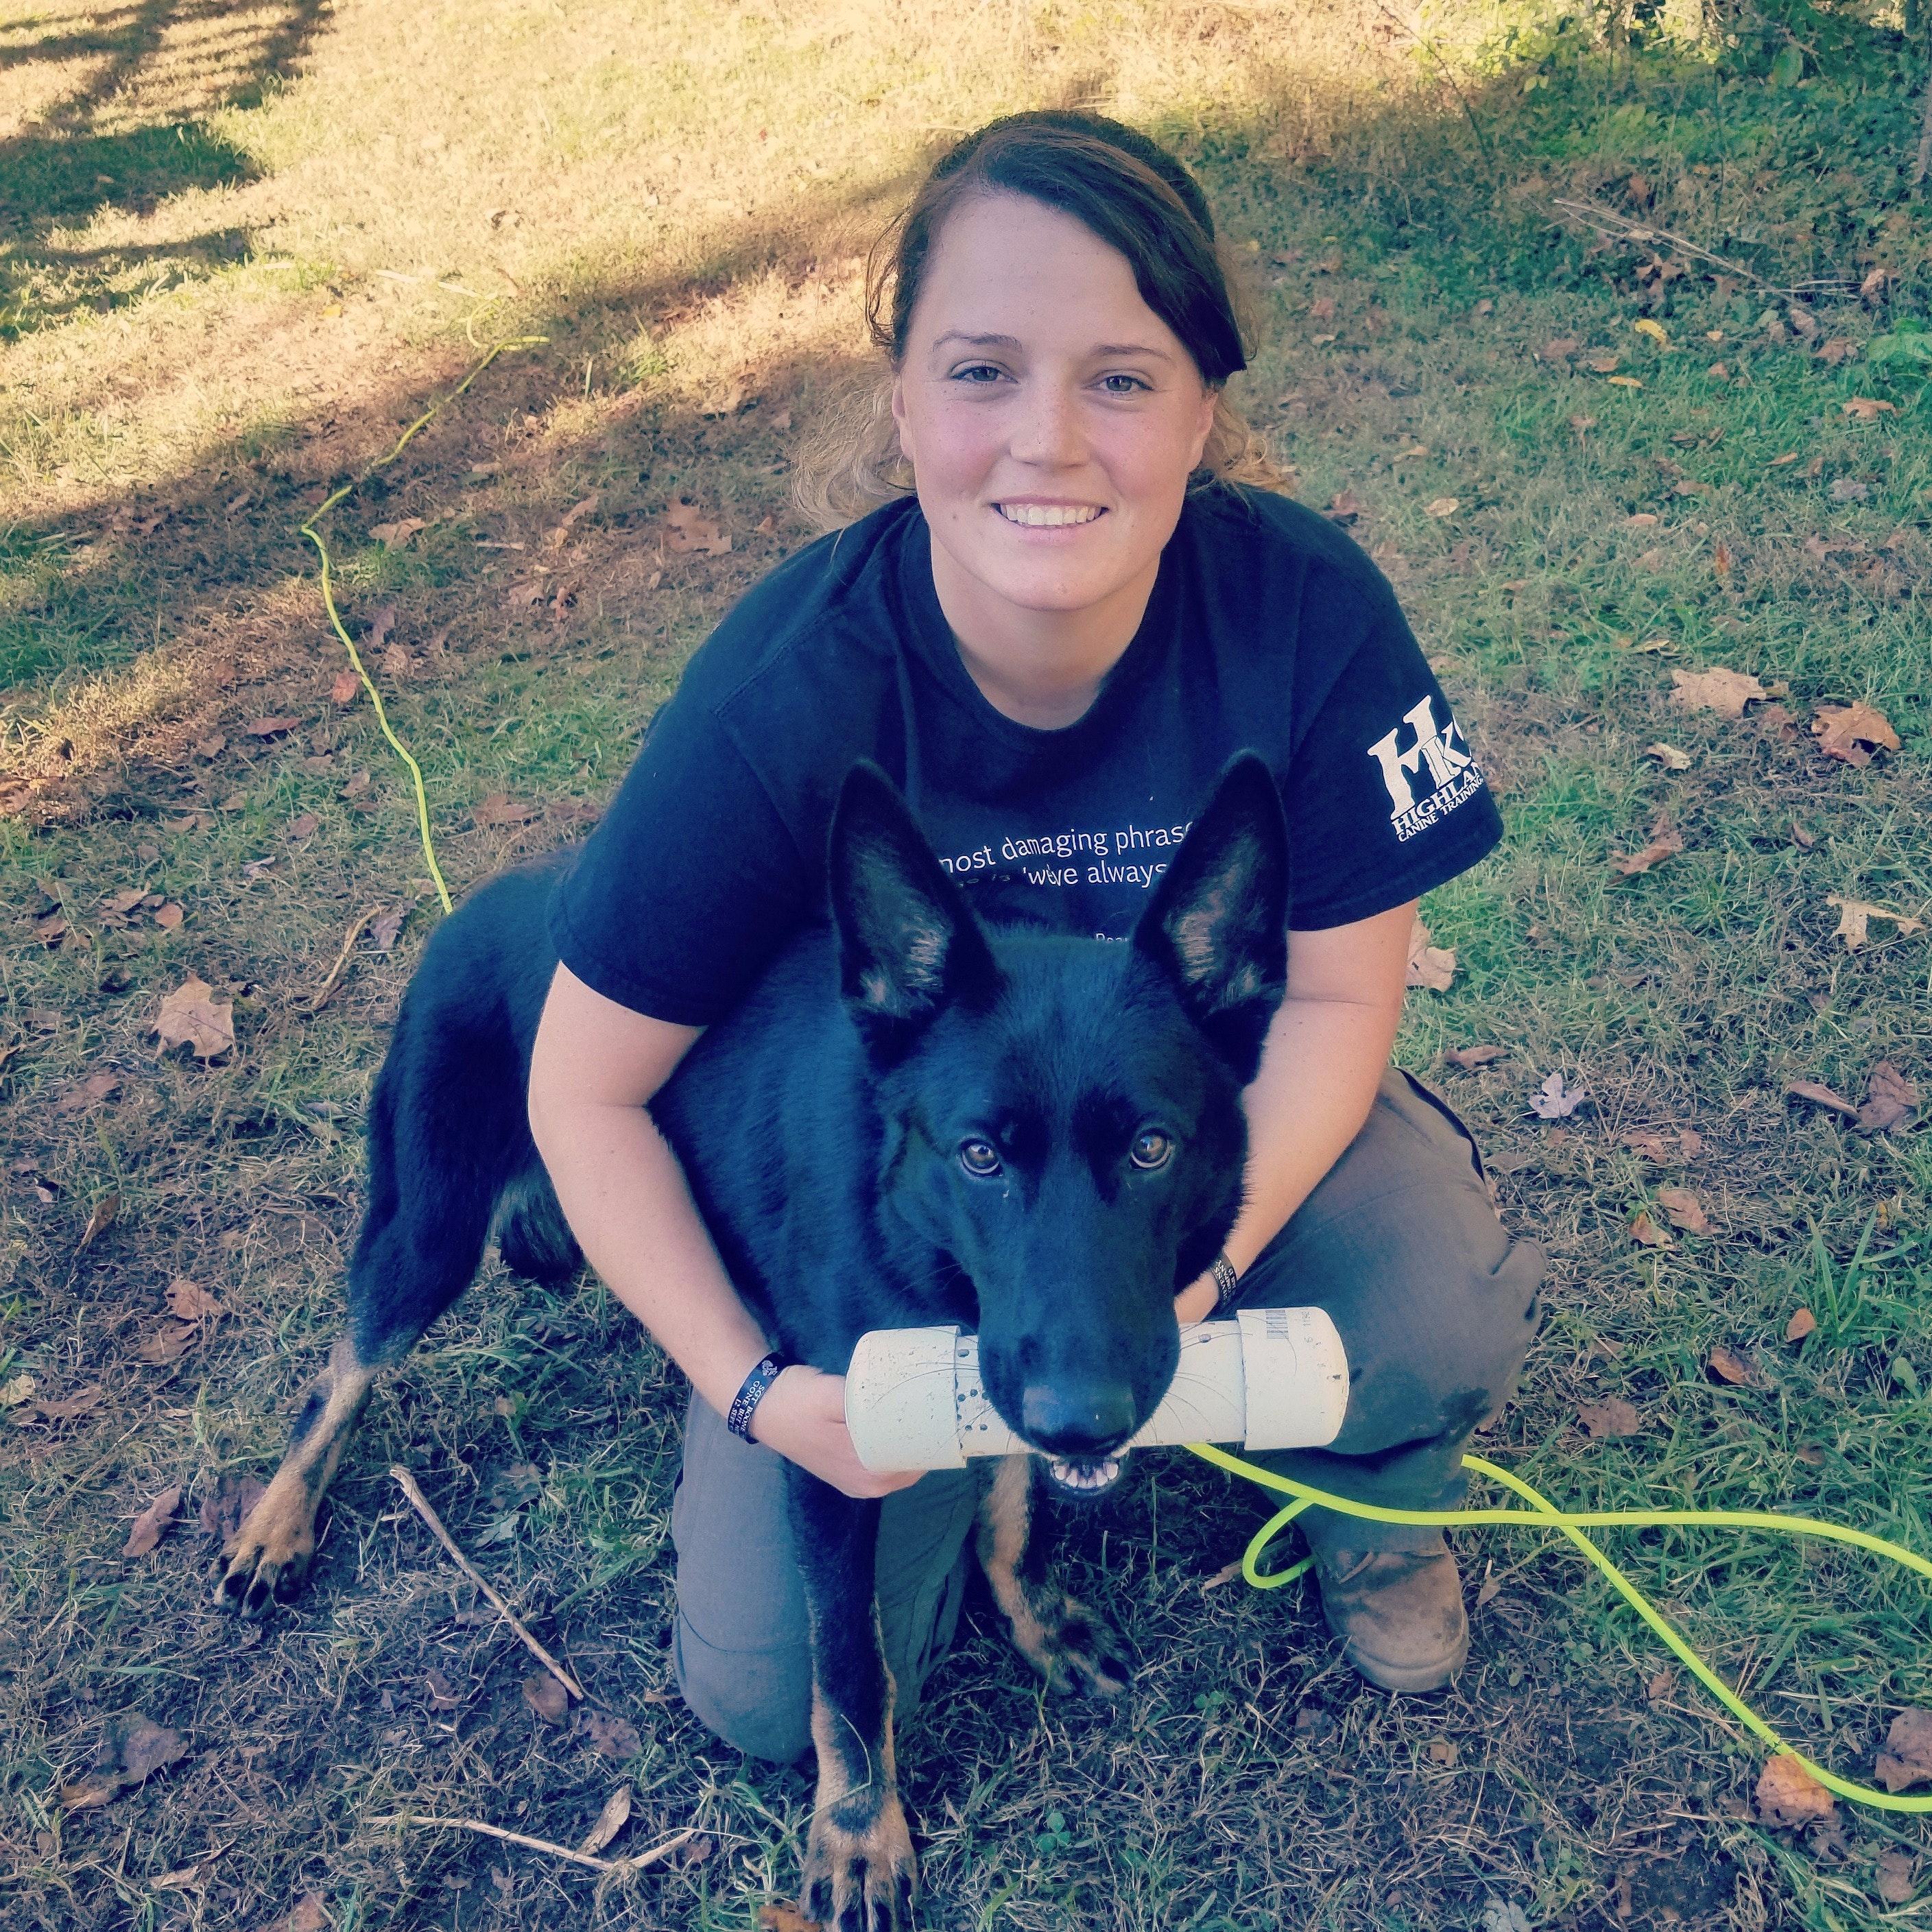 Kristen's dog day care